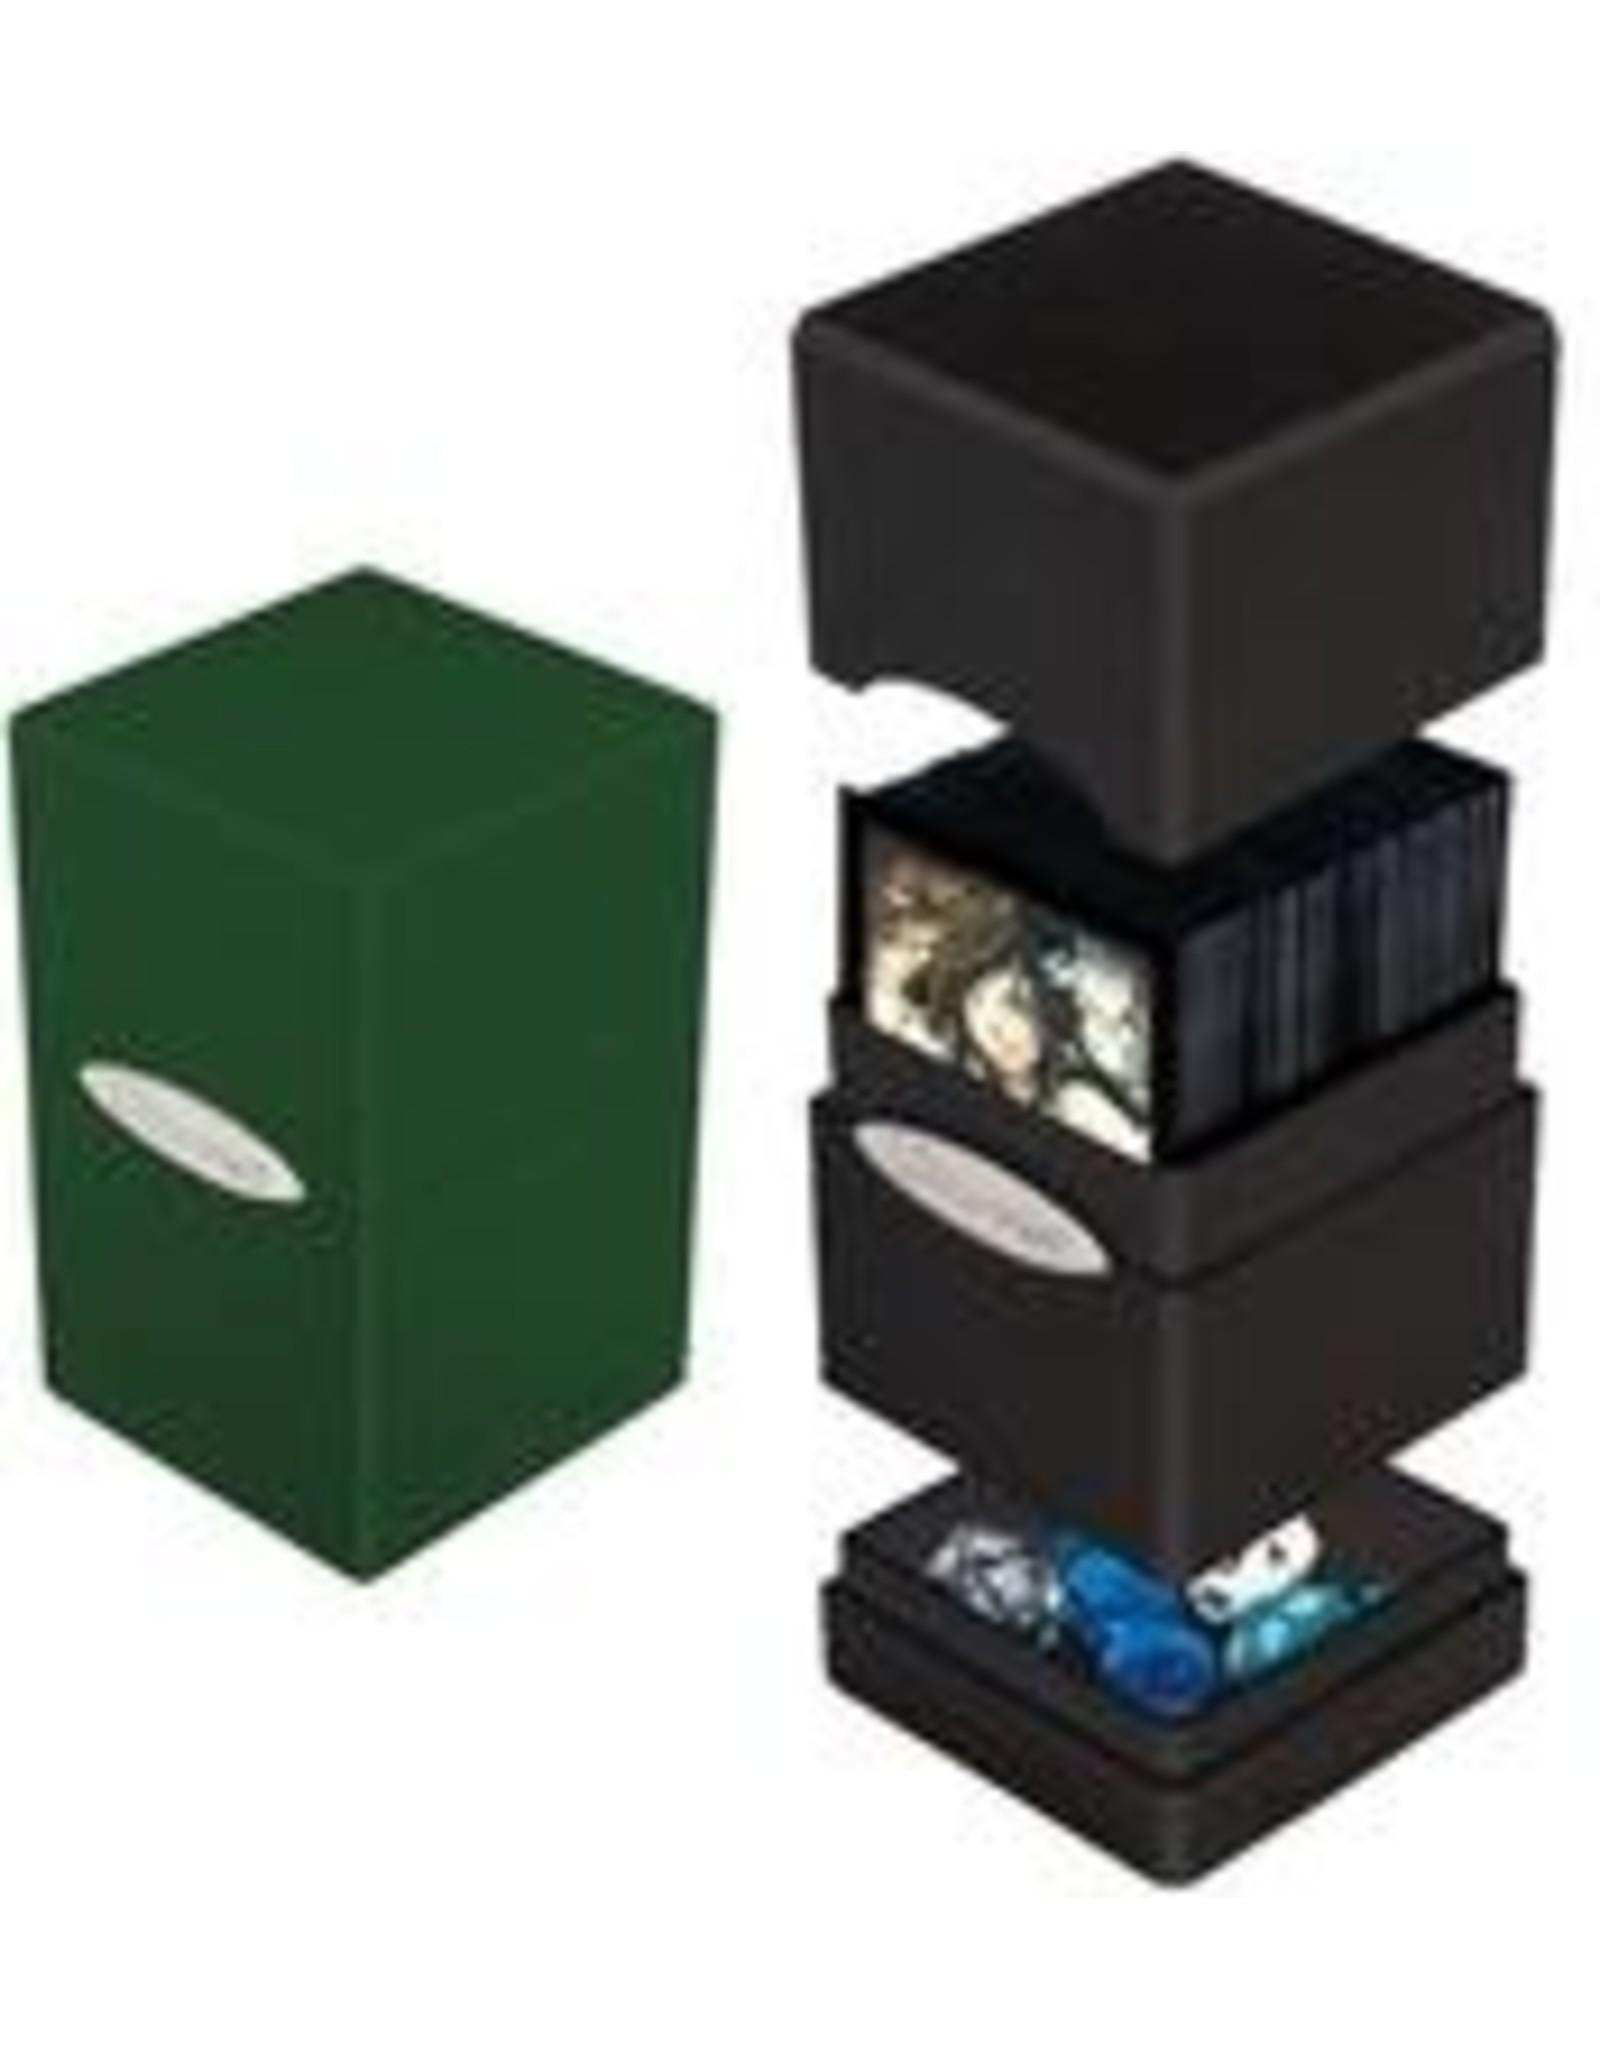 Ultra Pro Deck Box: Satin Tower Green